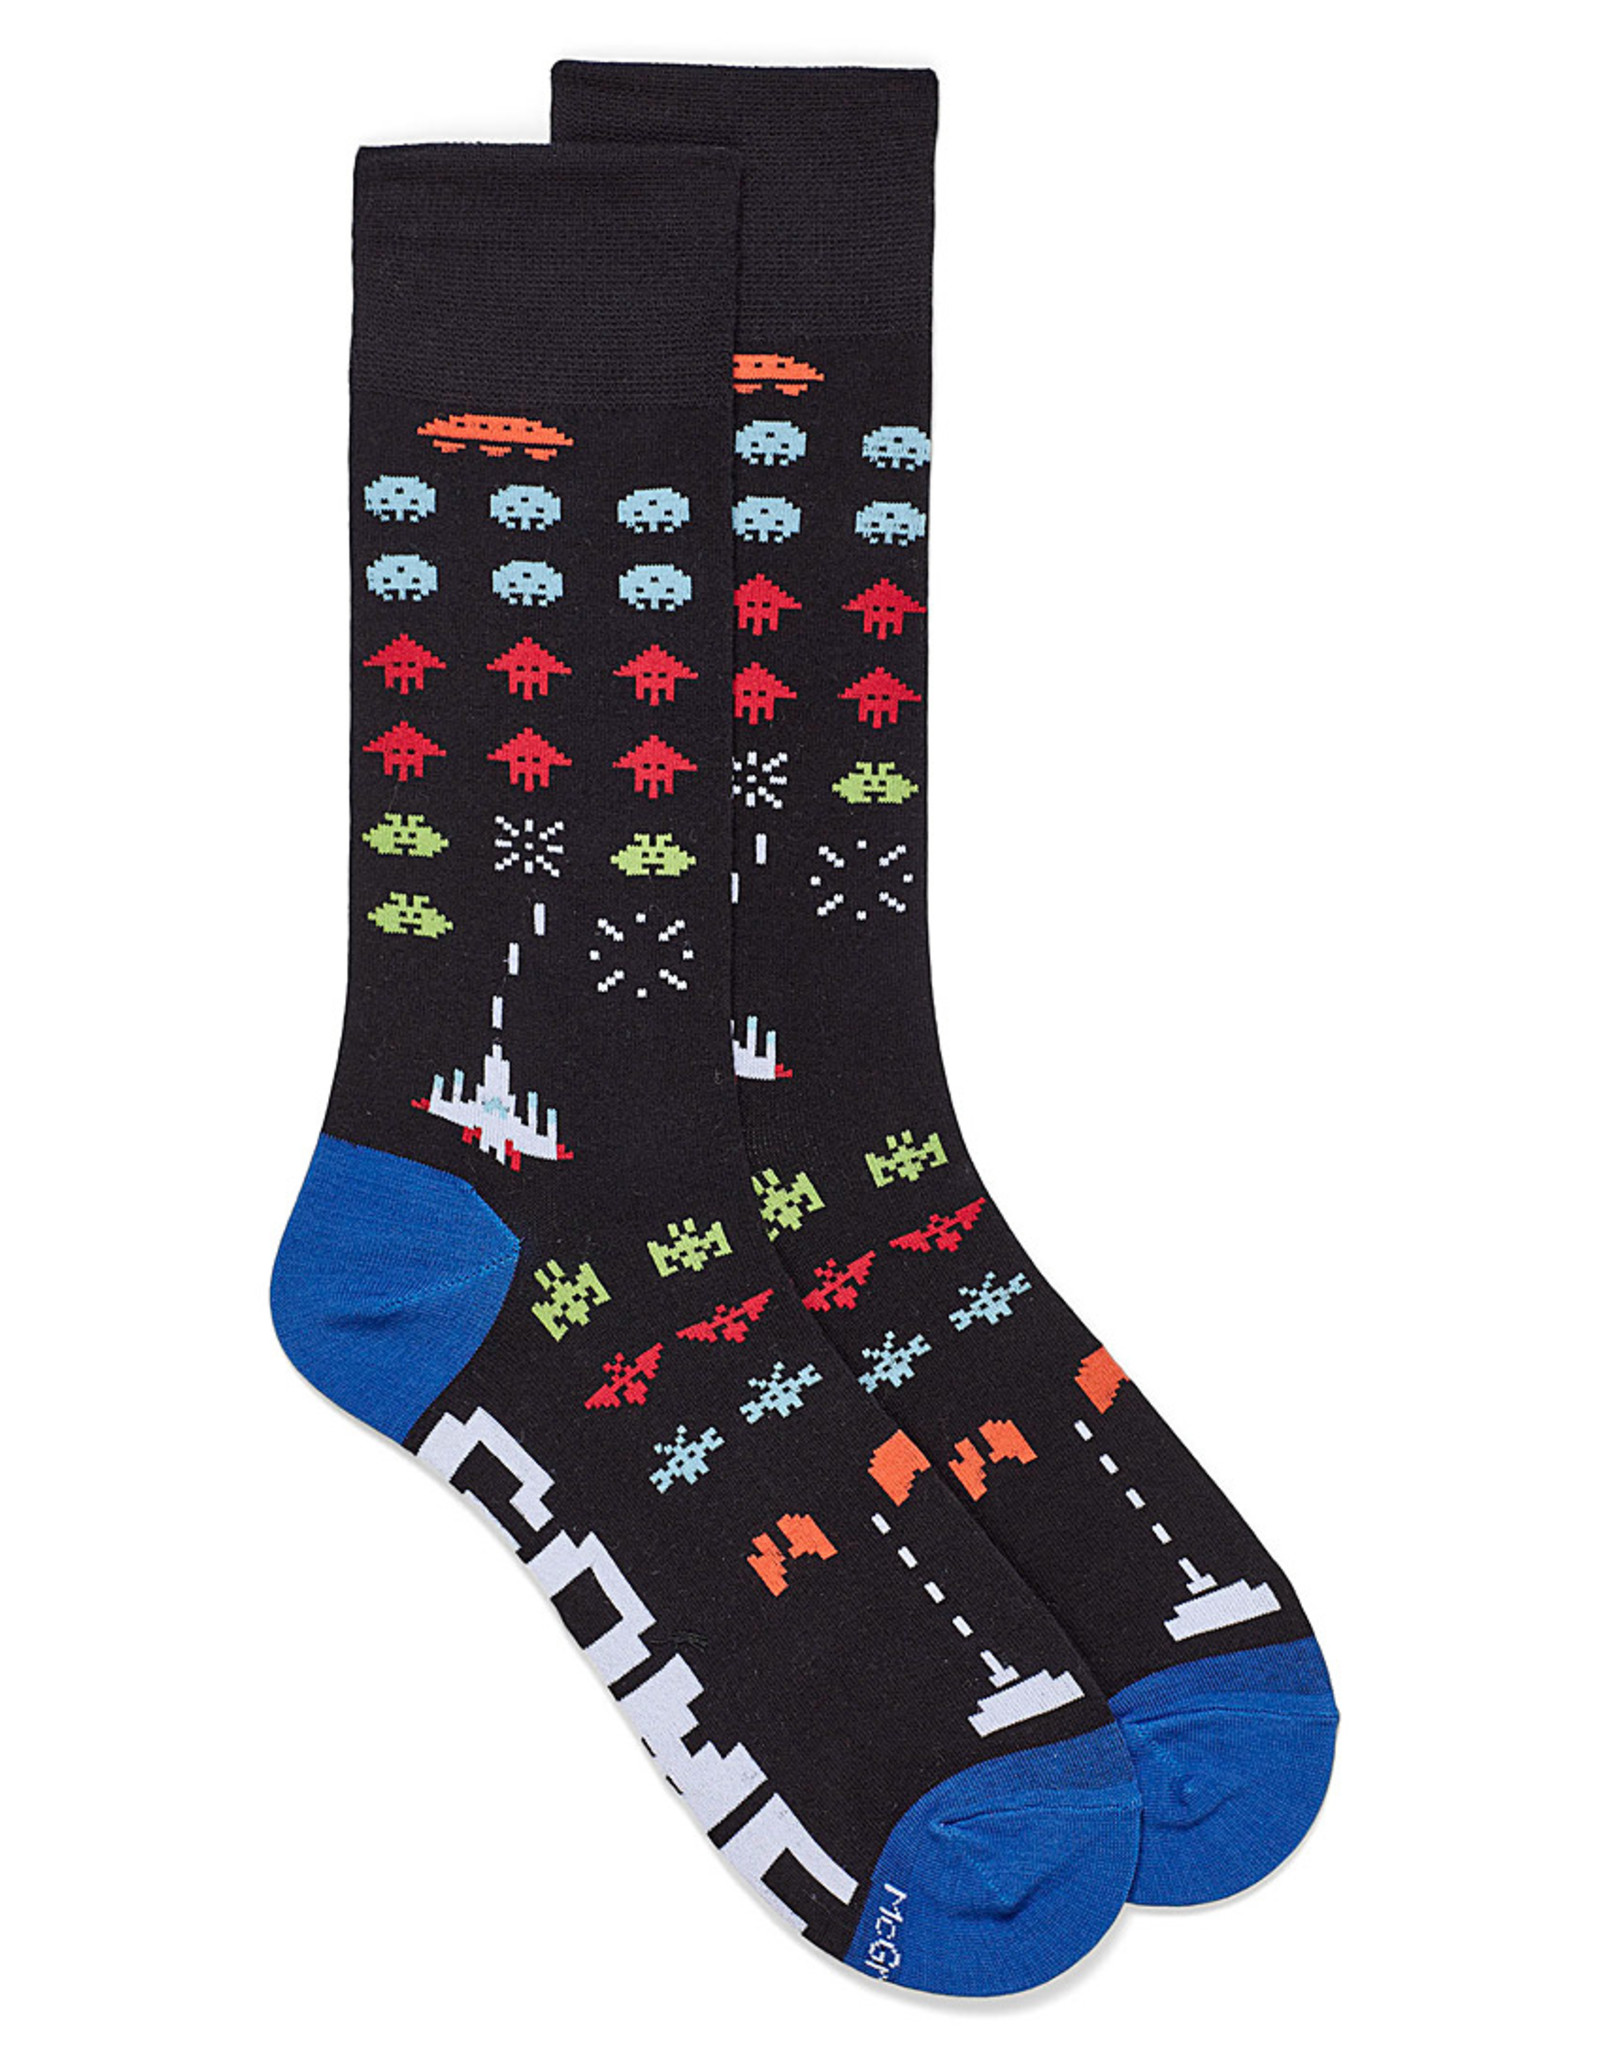 McGregor Socks Men's Space Invaders